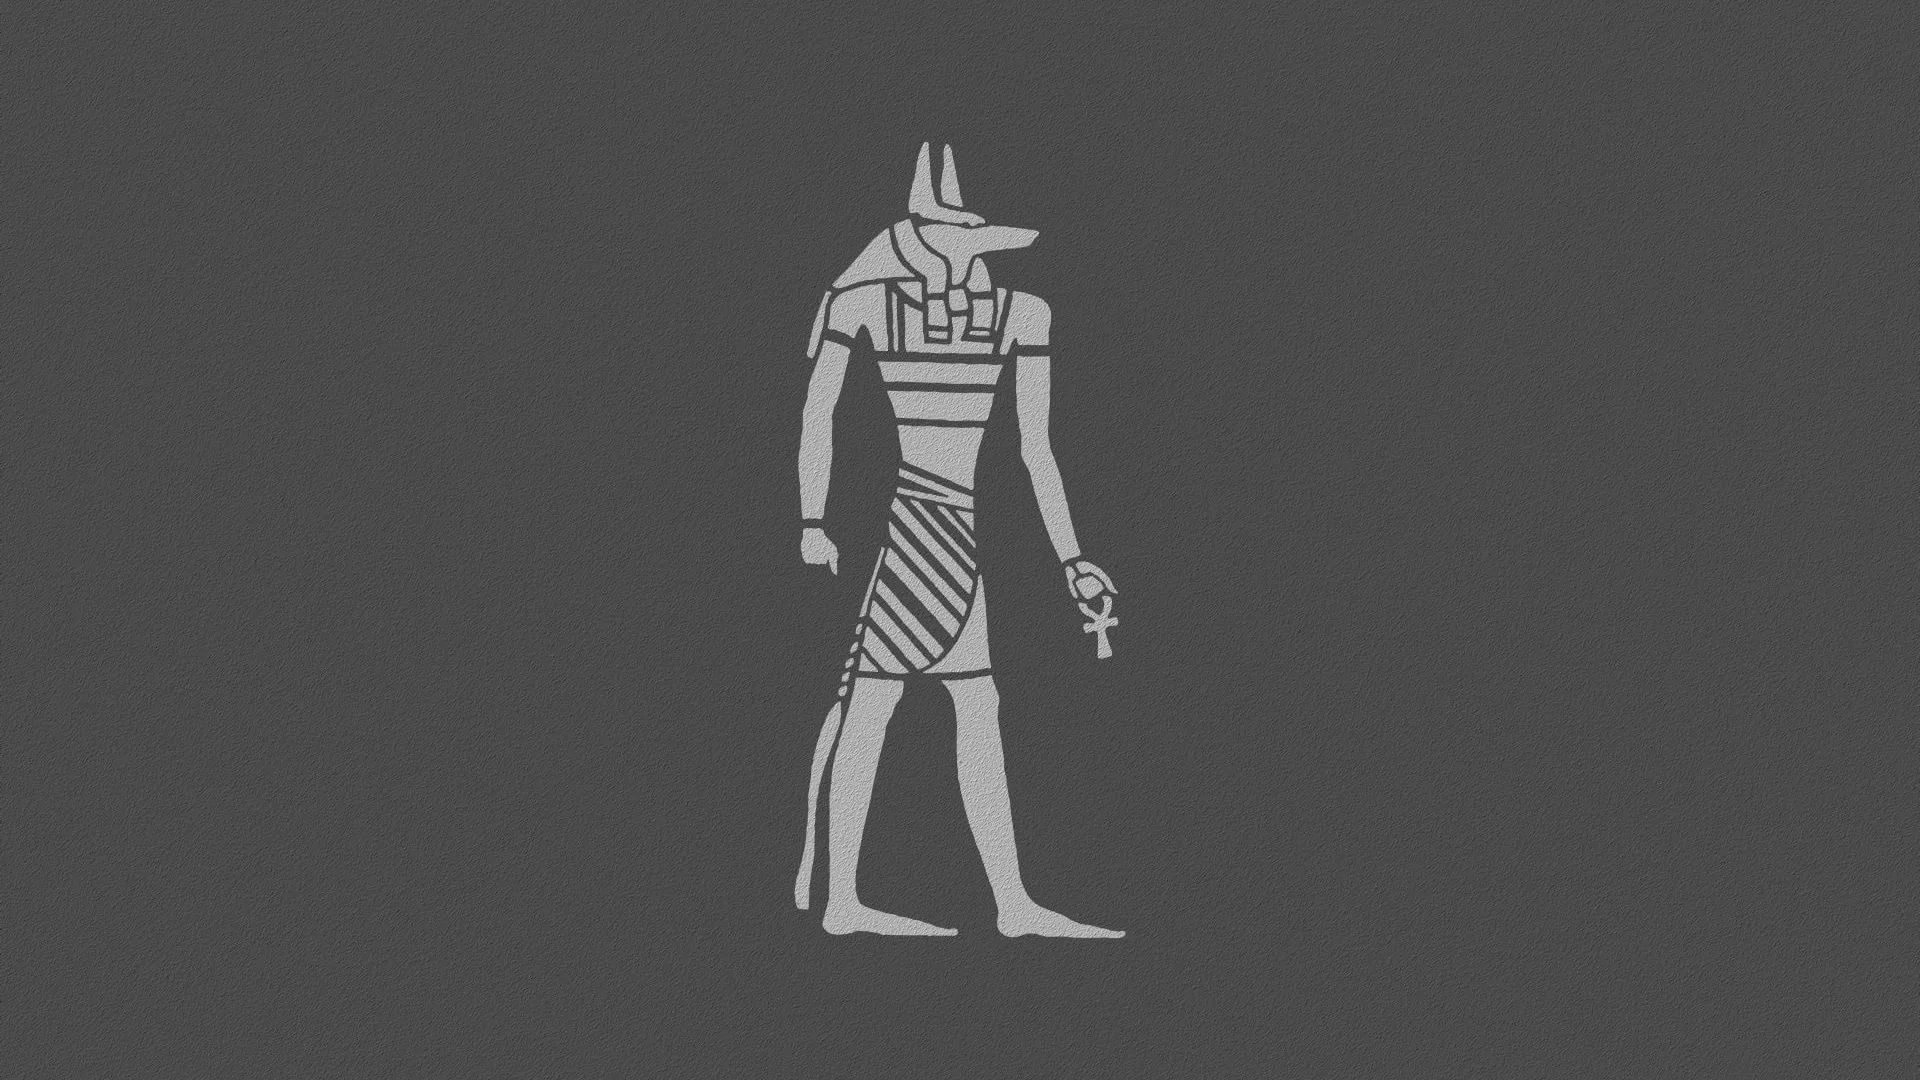 Cool Egyptian wallpaper photo